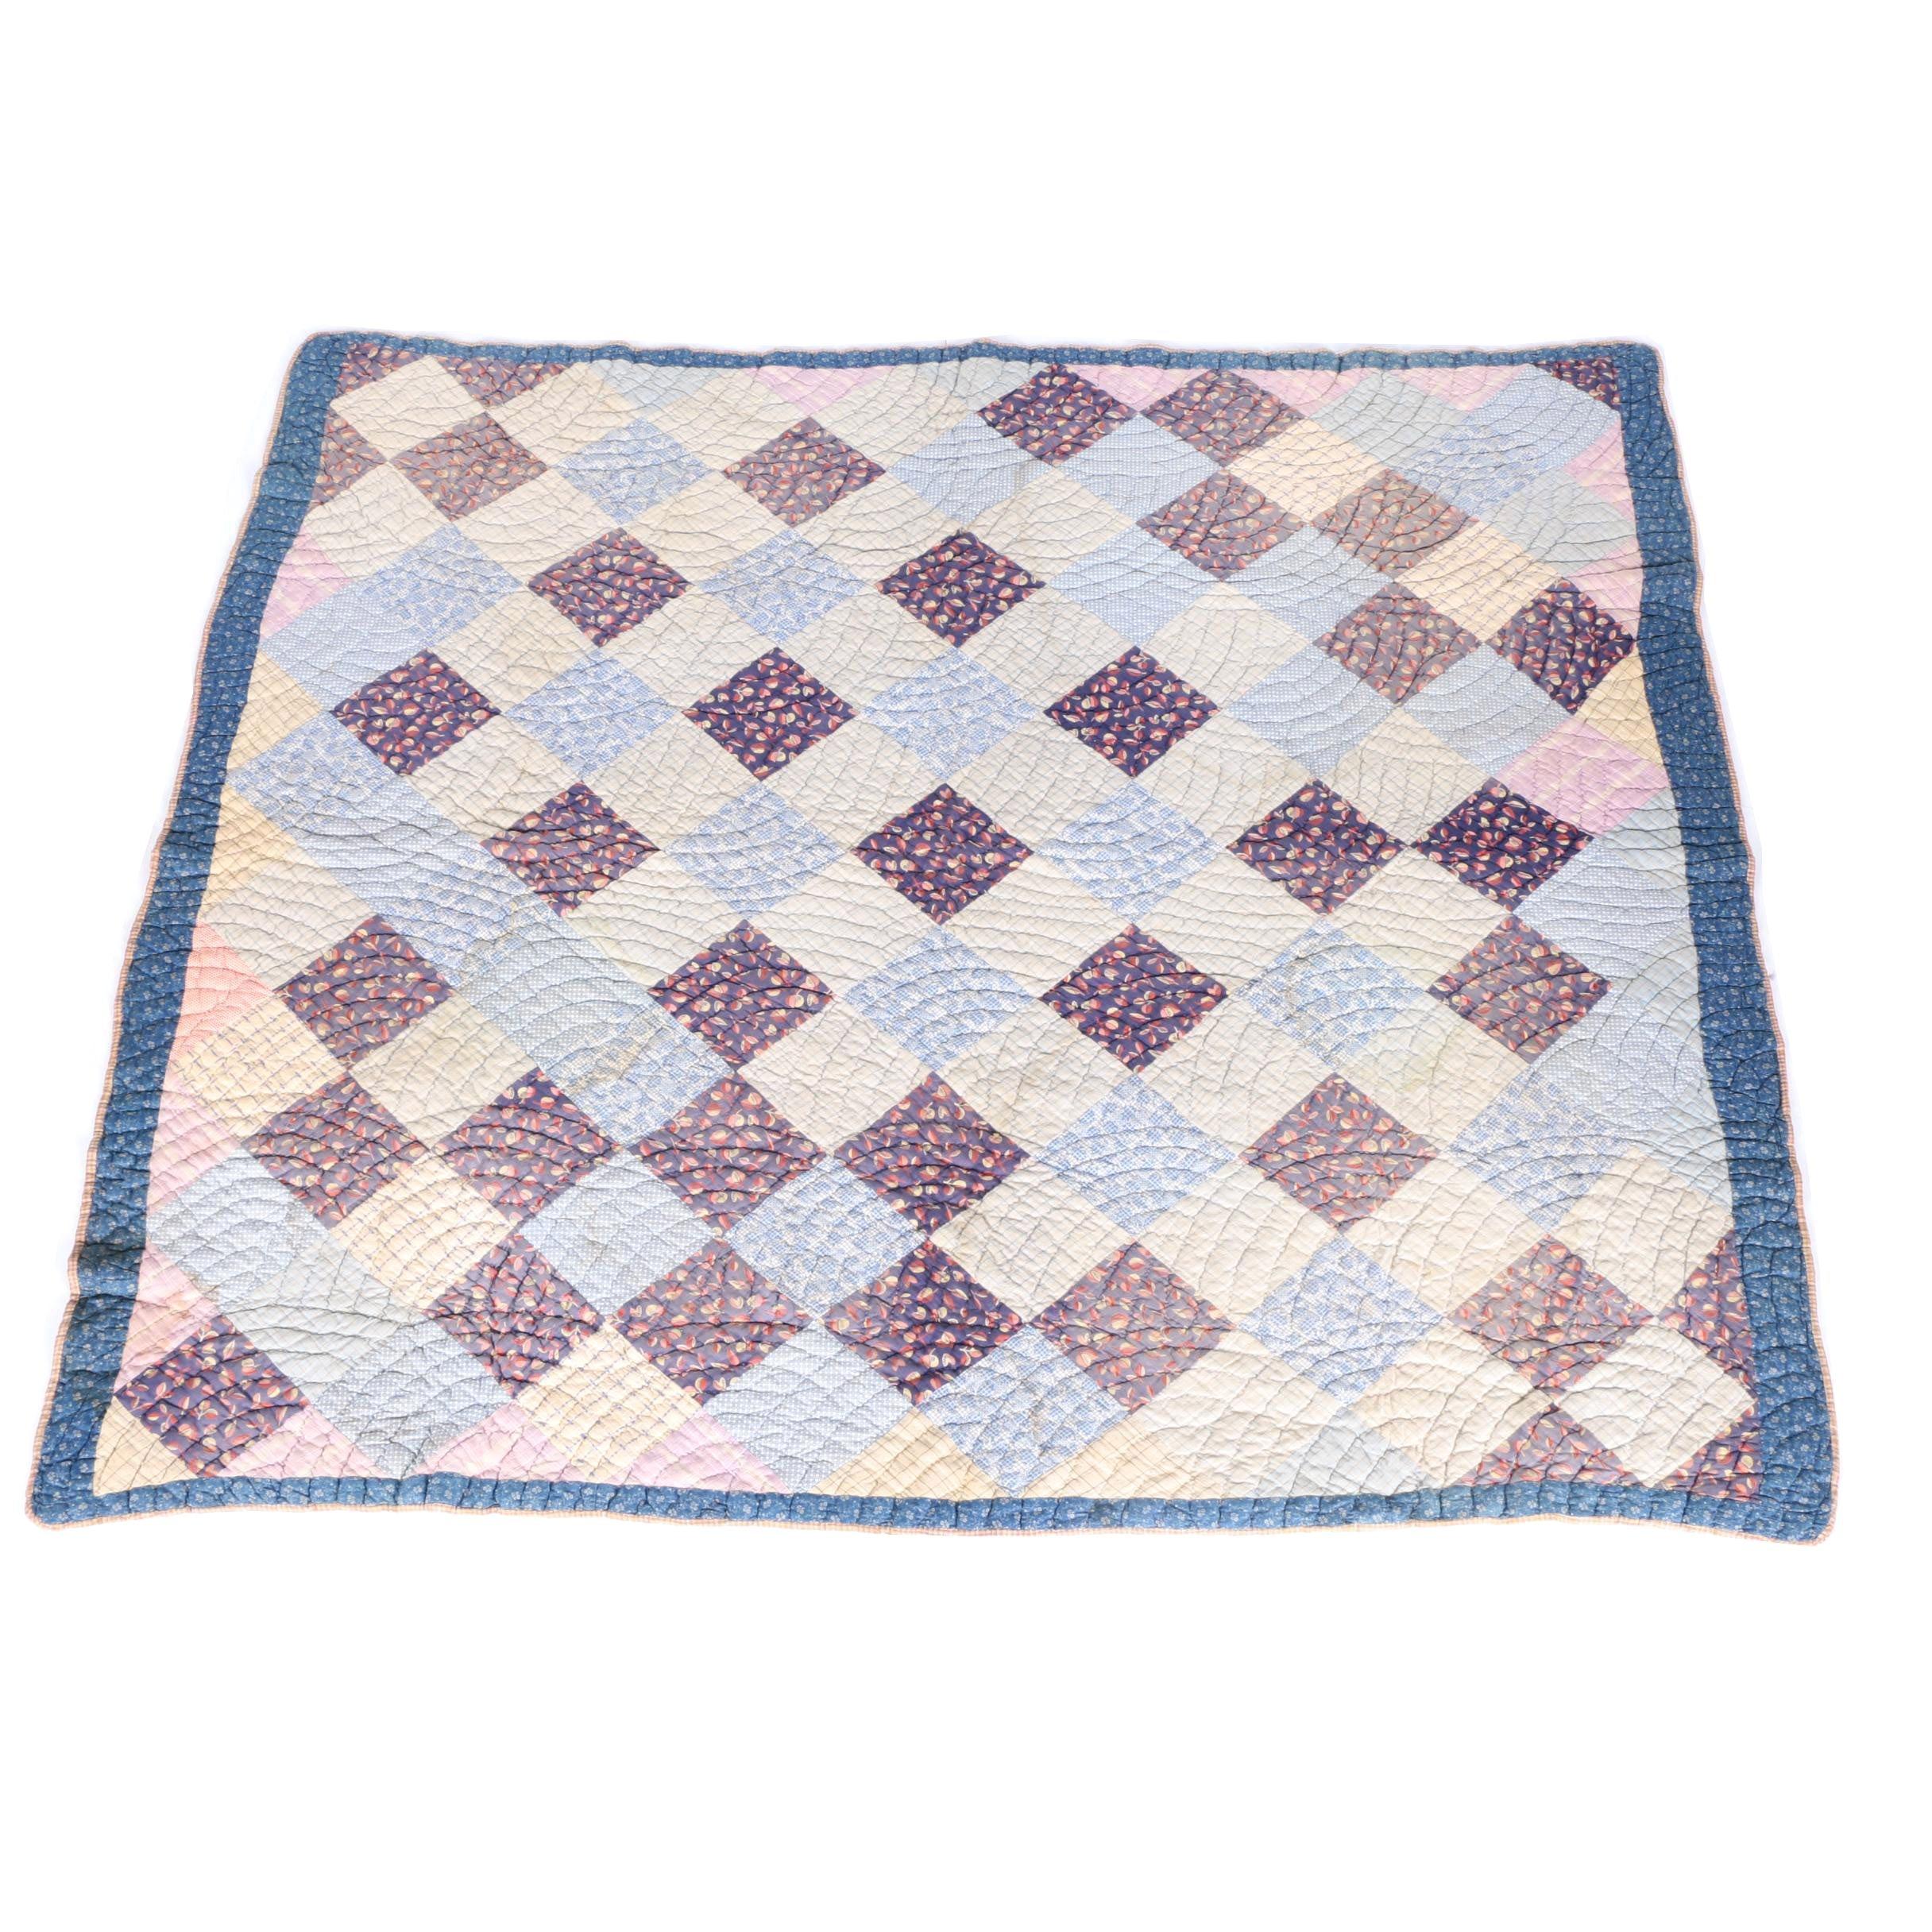 Vintage Hand Picked Block Pattern Quilt